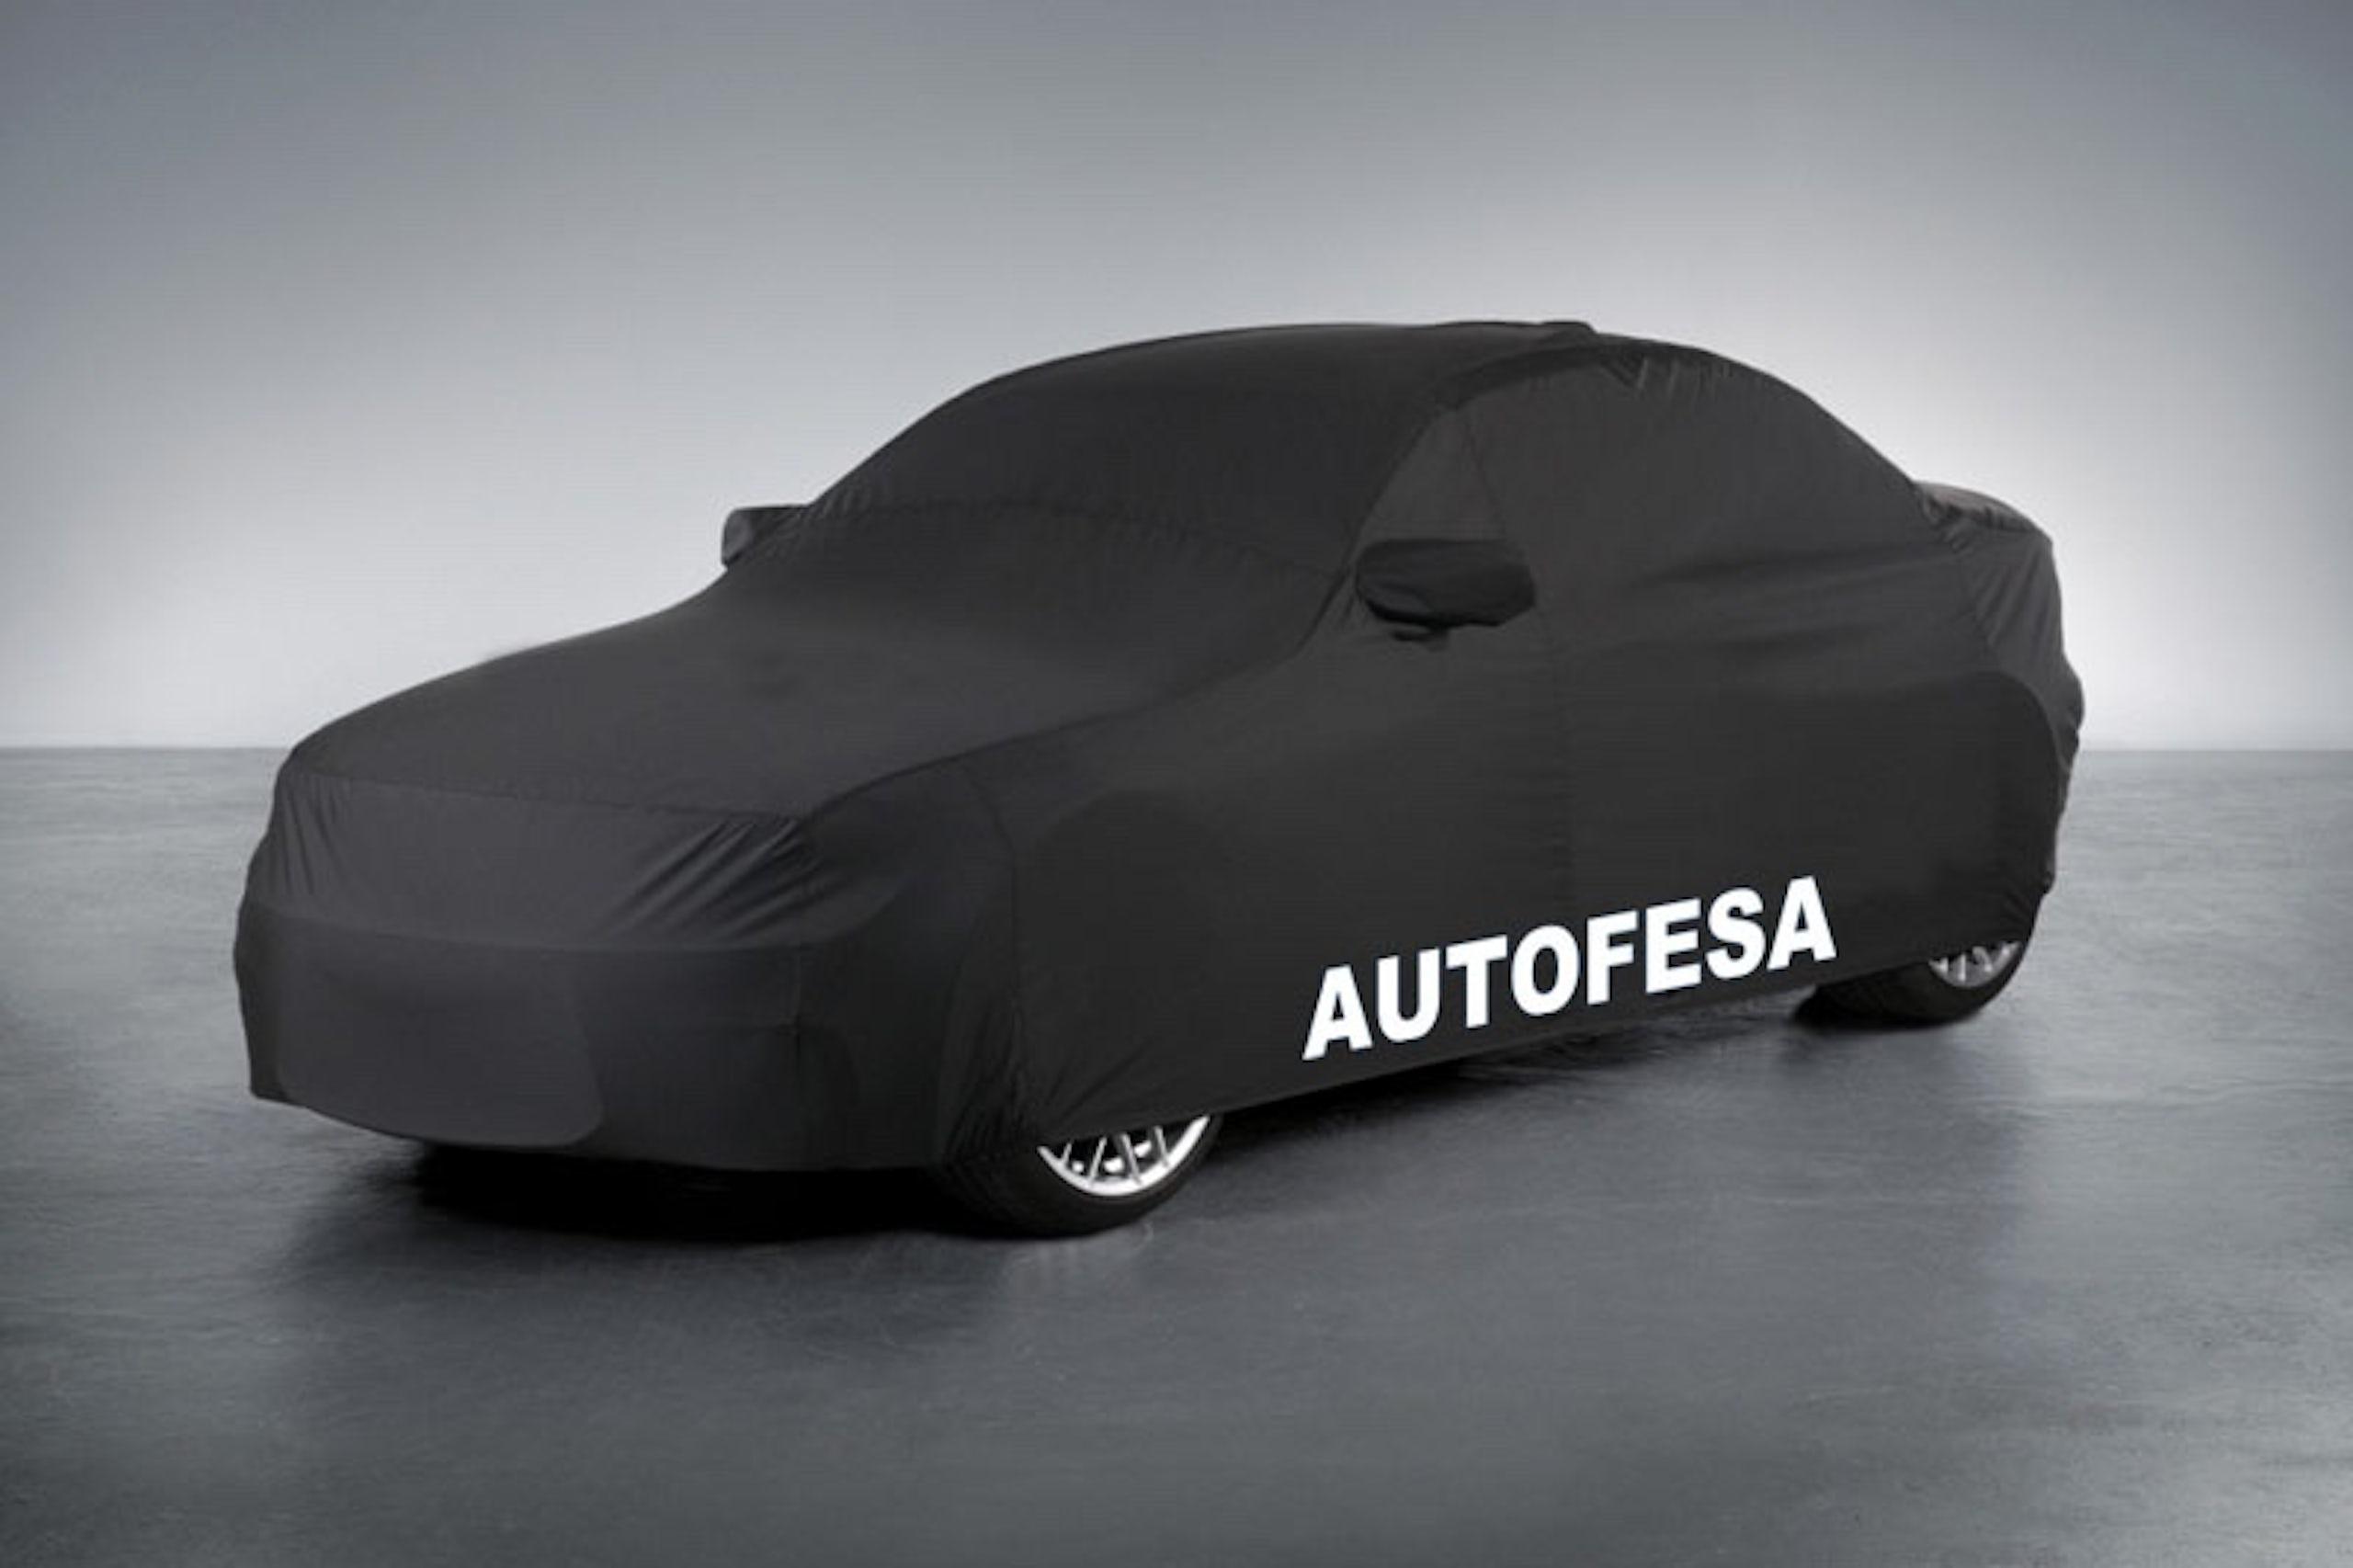 Ford Mondeo 2.0 TDCi 150cv Trend 5p Powershift Auto S/S - Foto 33